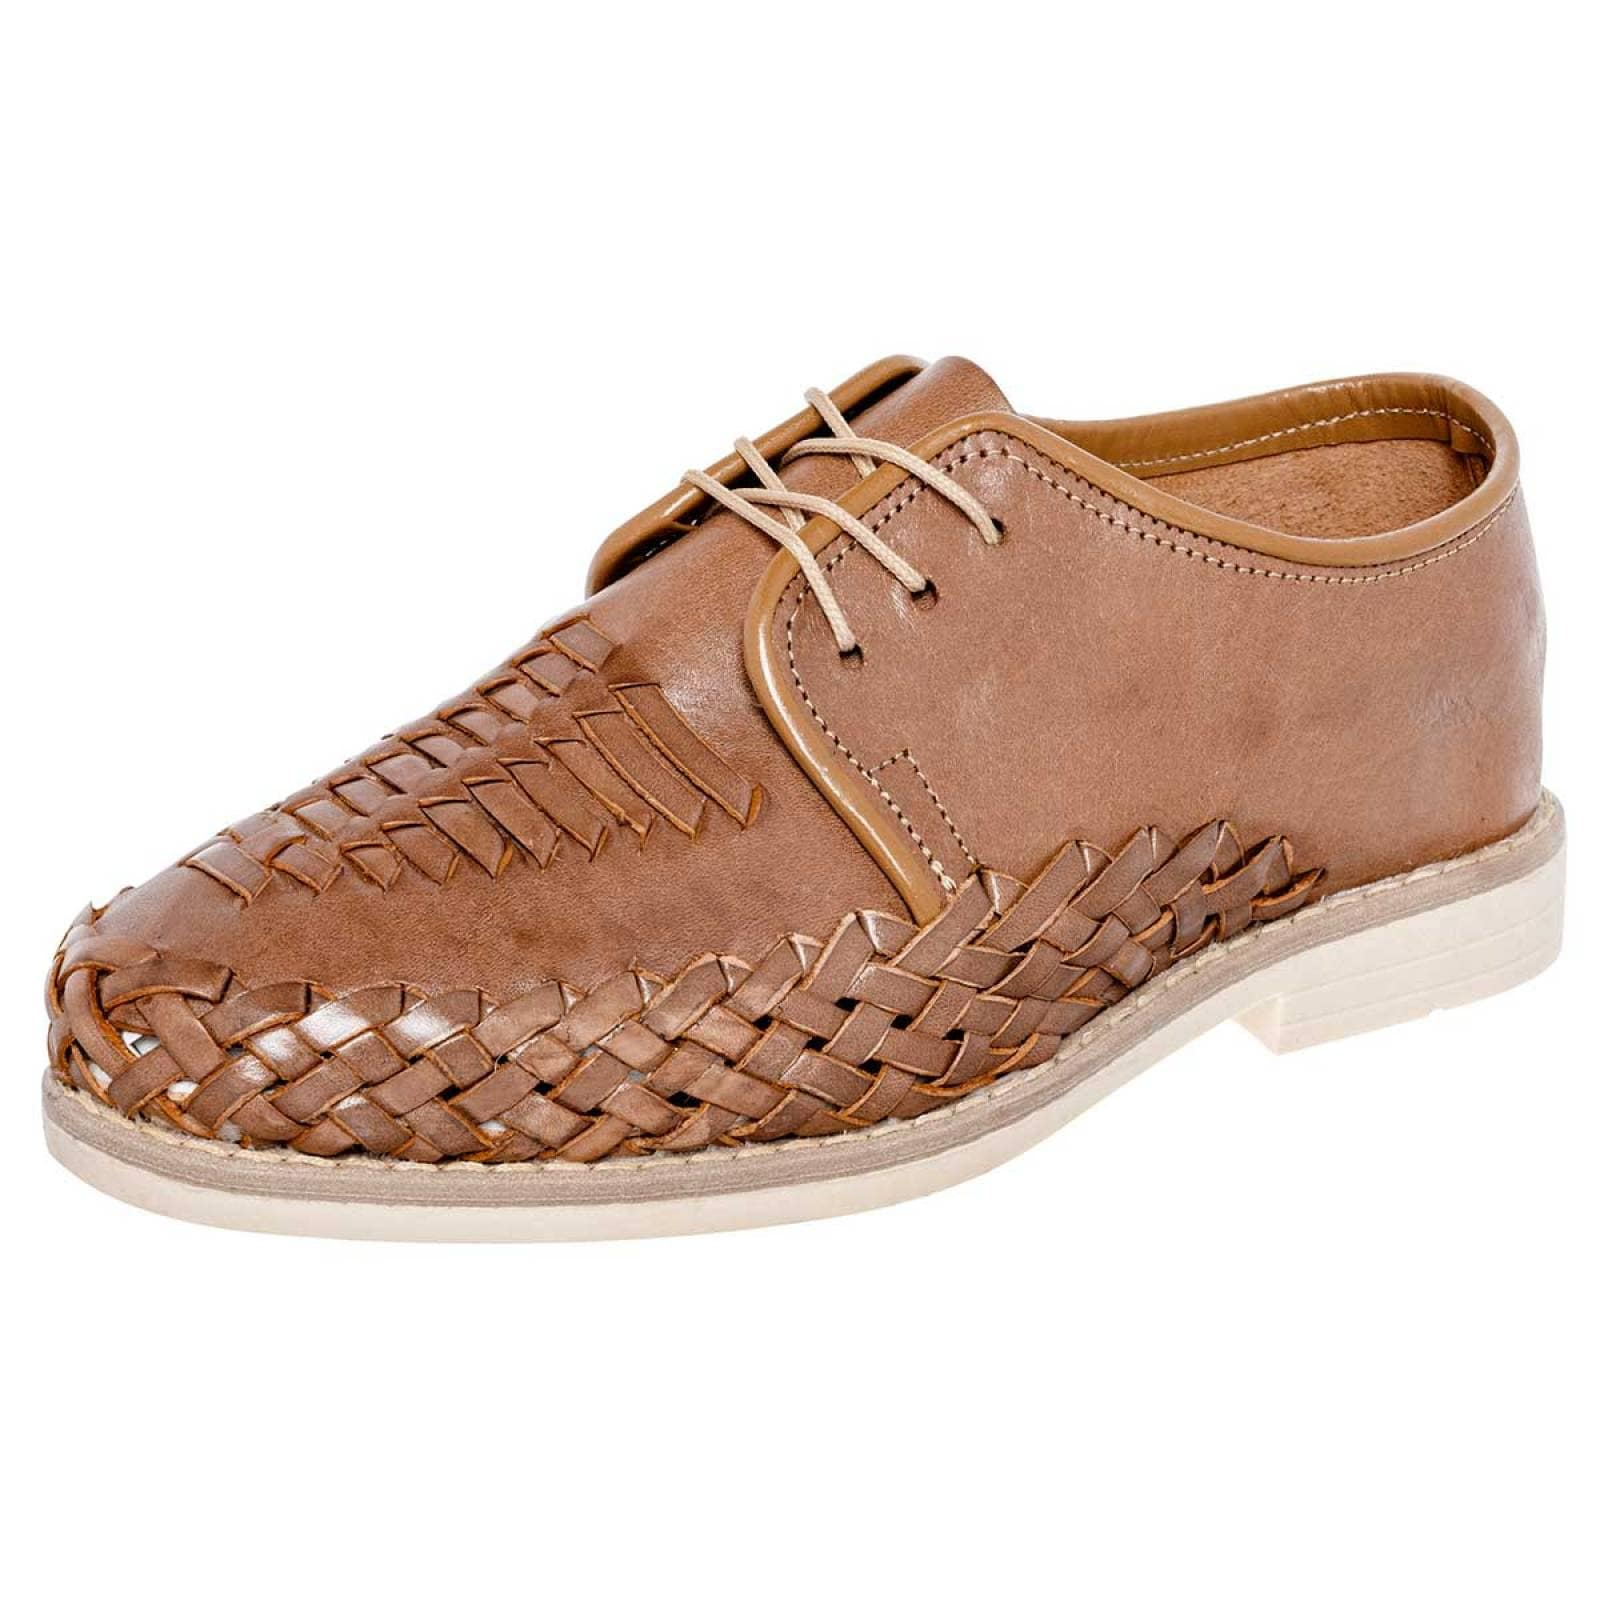 Indios Zapato Hombre Camel